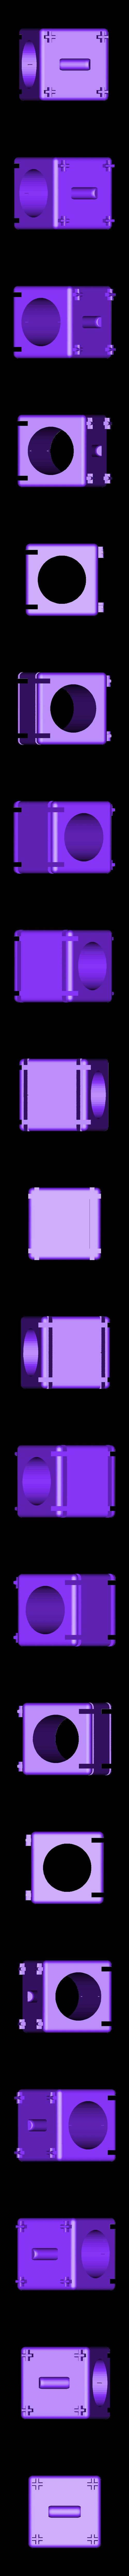 QM_Marble_Run_Tunnel.stl Download free STL file QM Marble Run • 3D printer design, quirkymojo